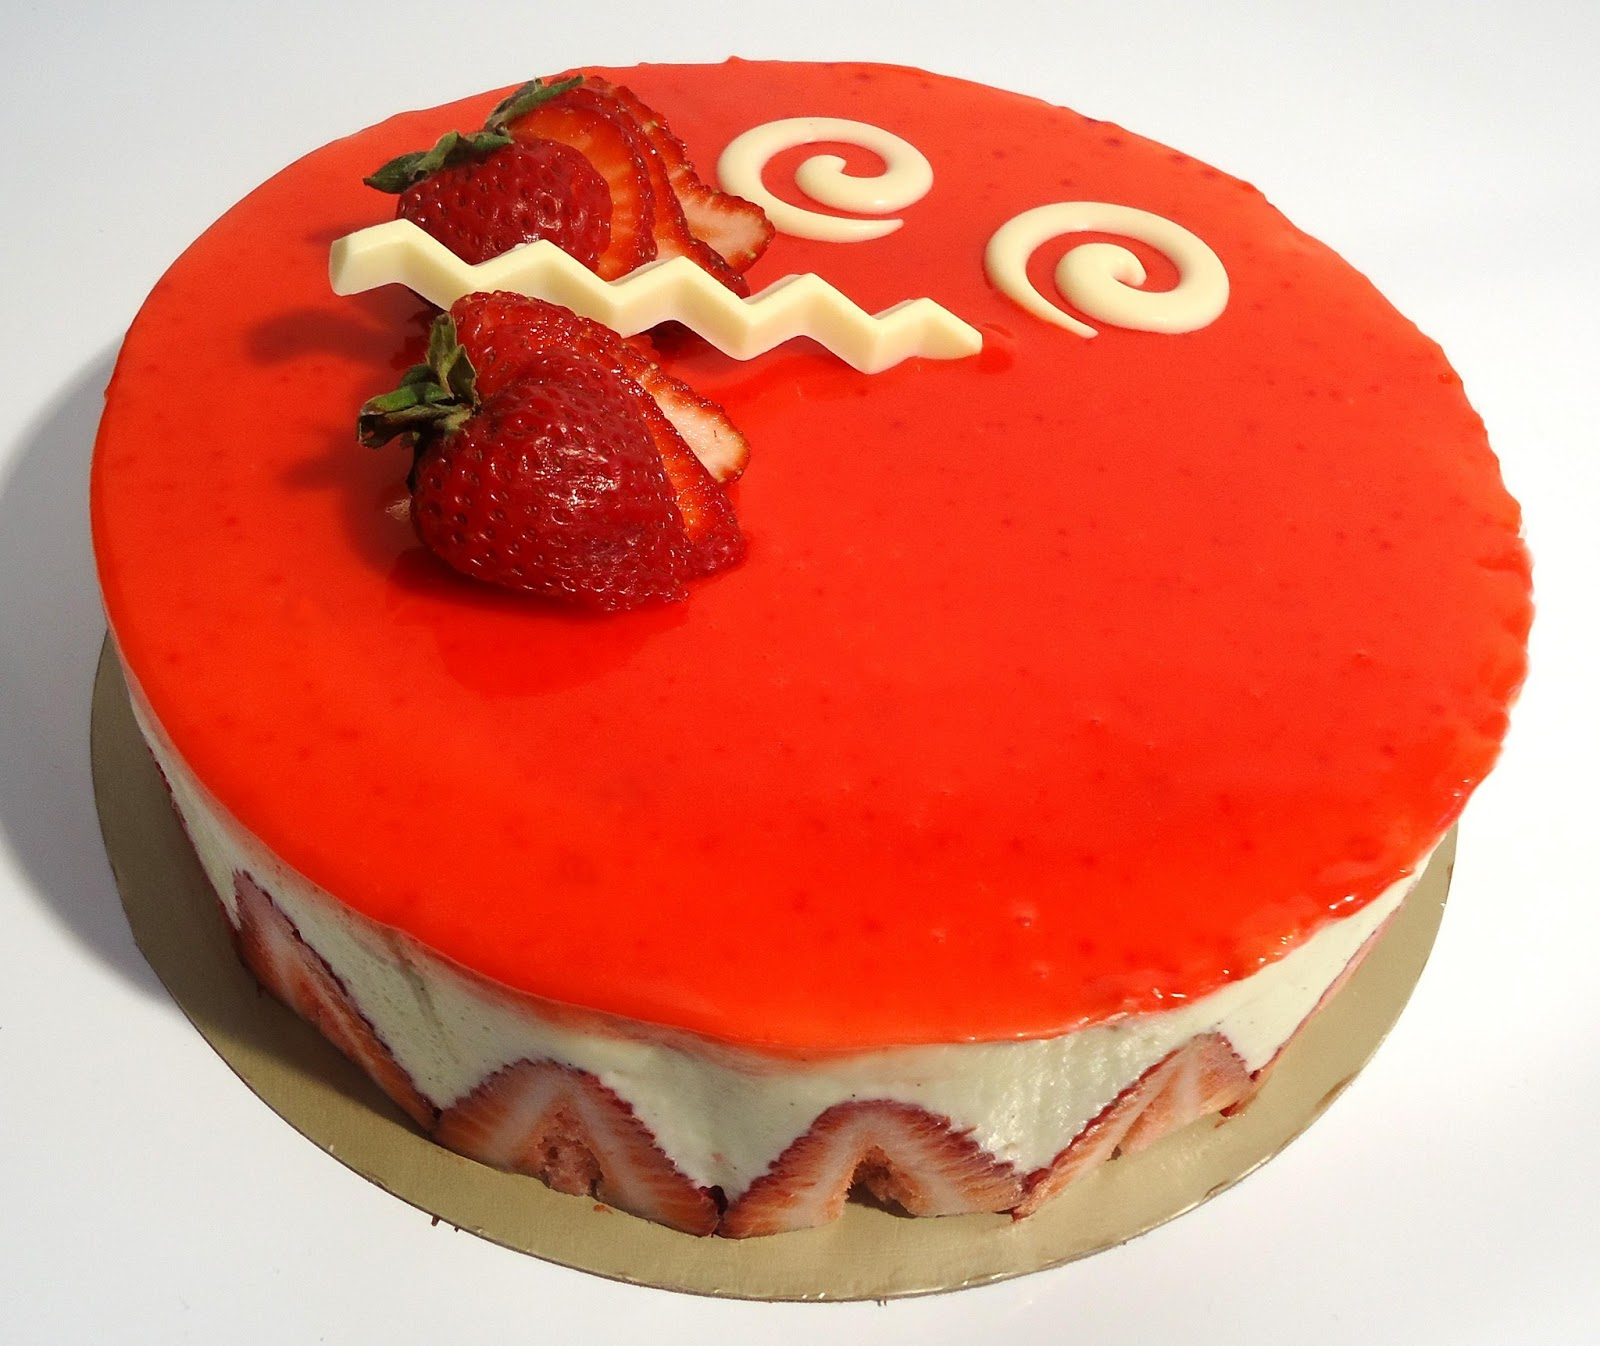 Minicuisine fraisier moderne for Glacage miroir fraise